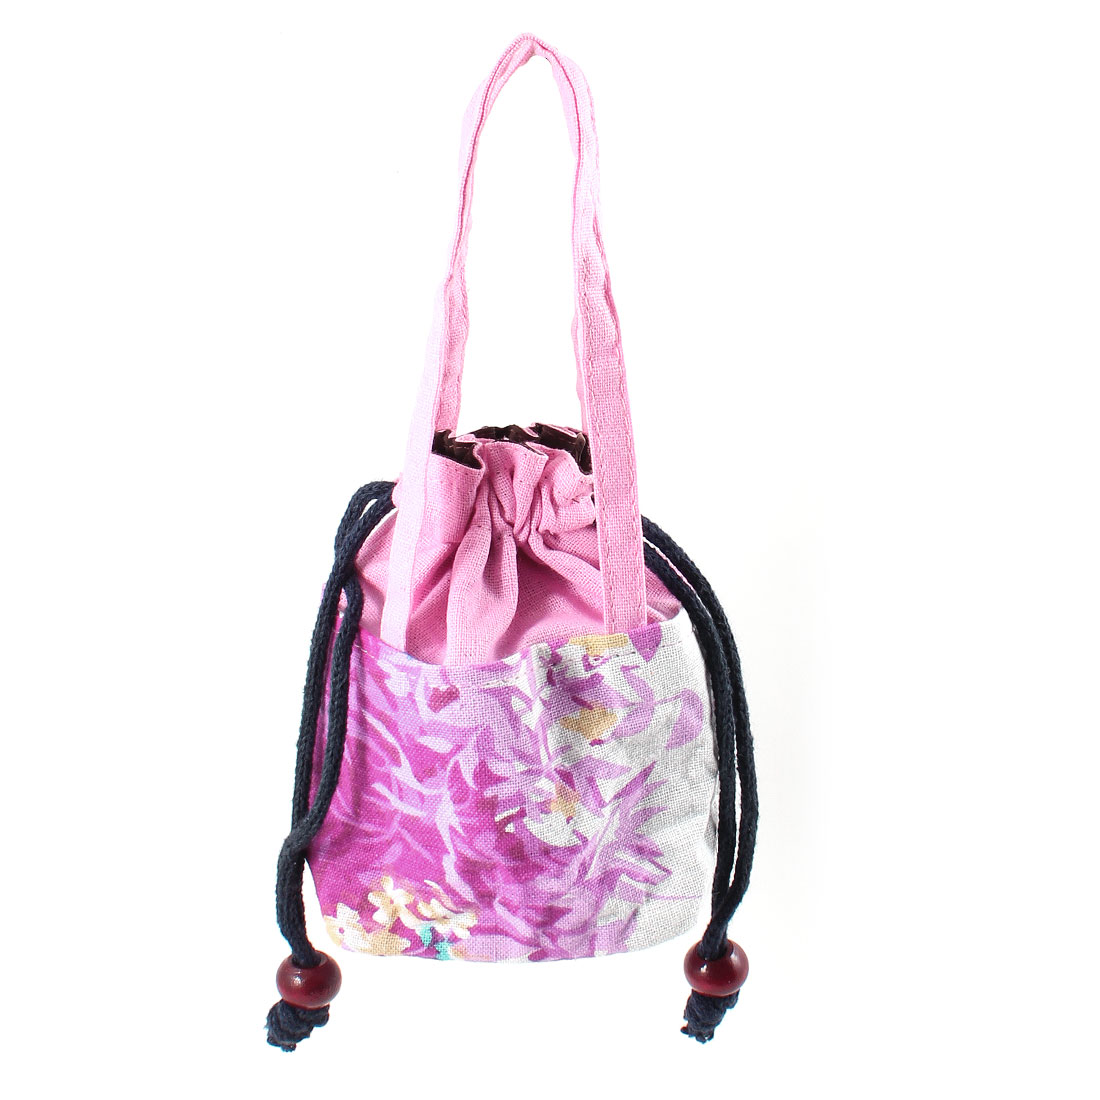 Lady Drawstring Floral Printed Pink Wrist Strap Handbag Tote Purse